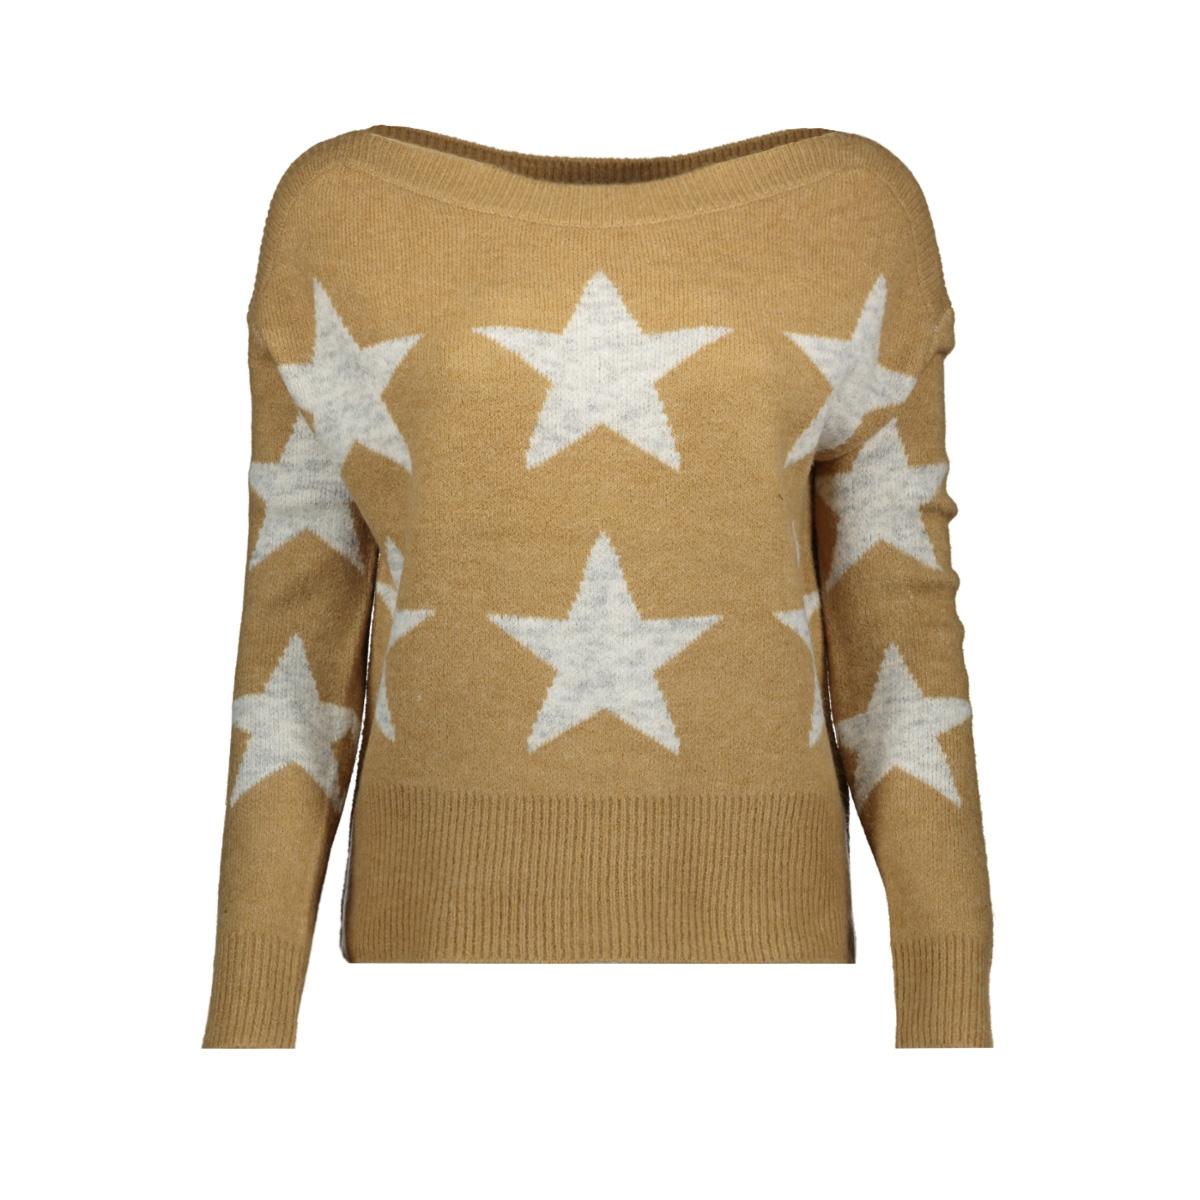 onlaurelie l/s pullover knt 15184470 only trui tannin lgm stars